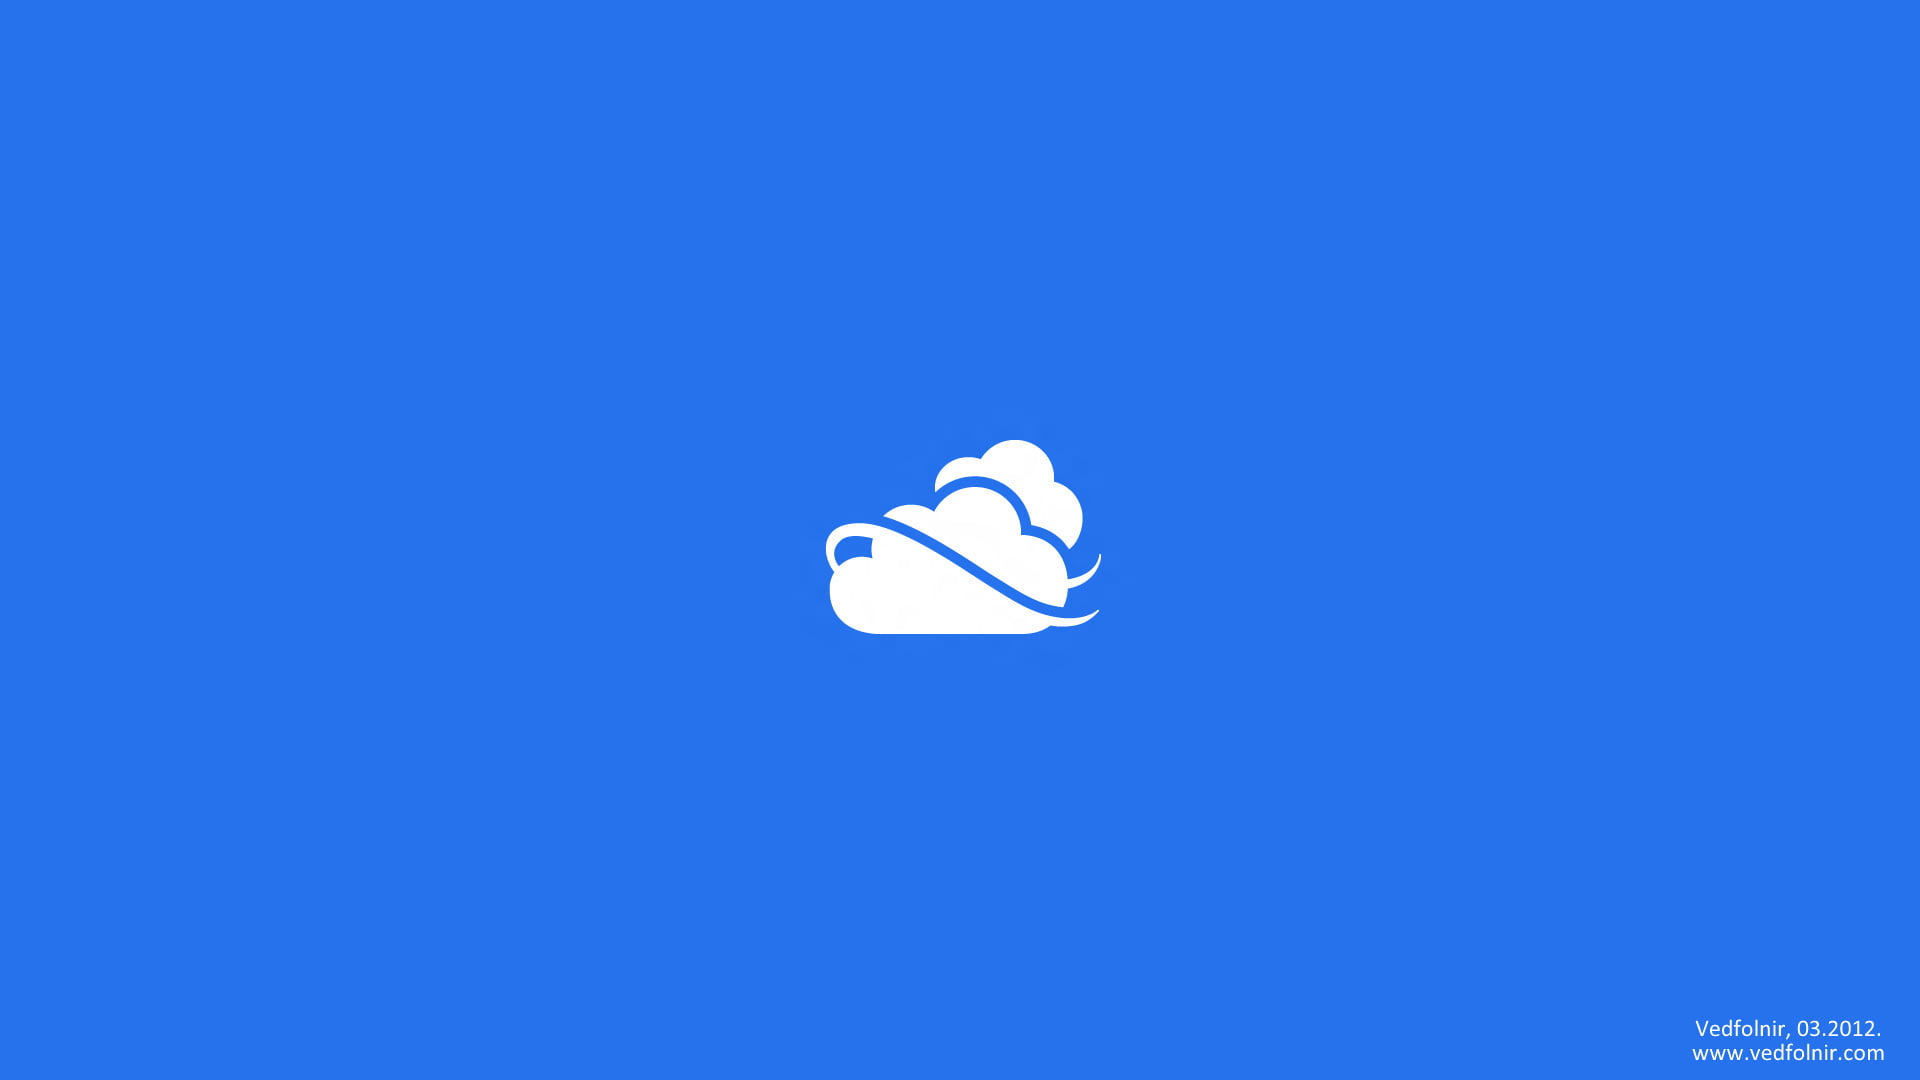 WIndows 8 Weather App 微軟 Microsoft Windows 8 Consumer Preview 使用心得與下載教學